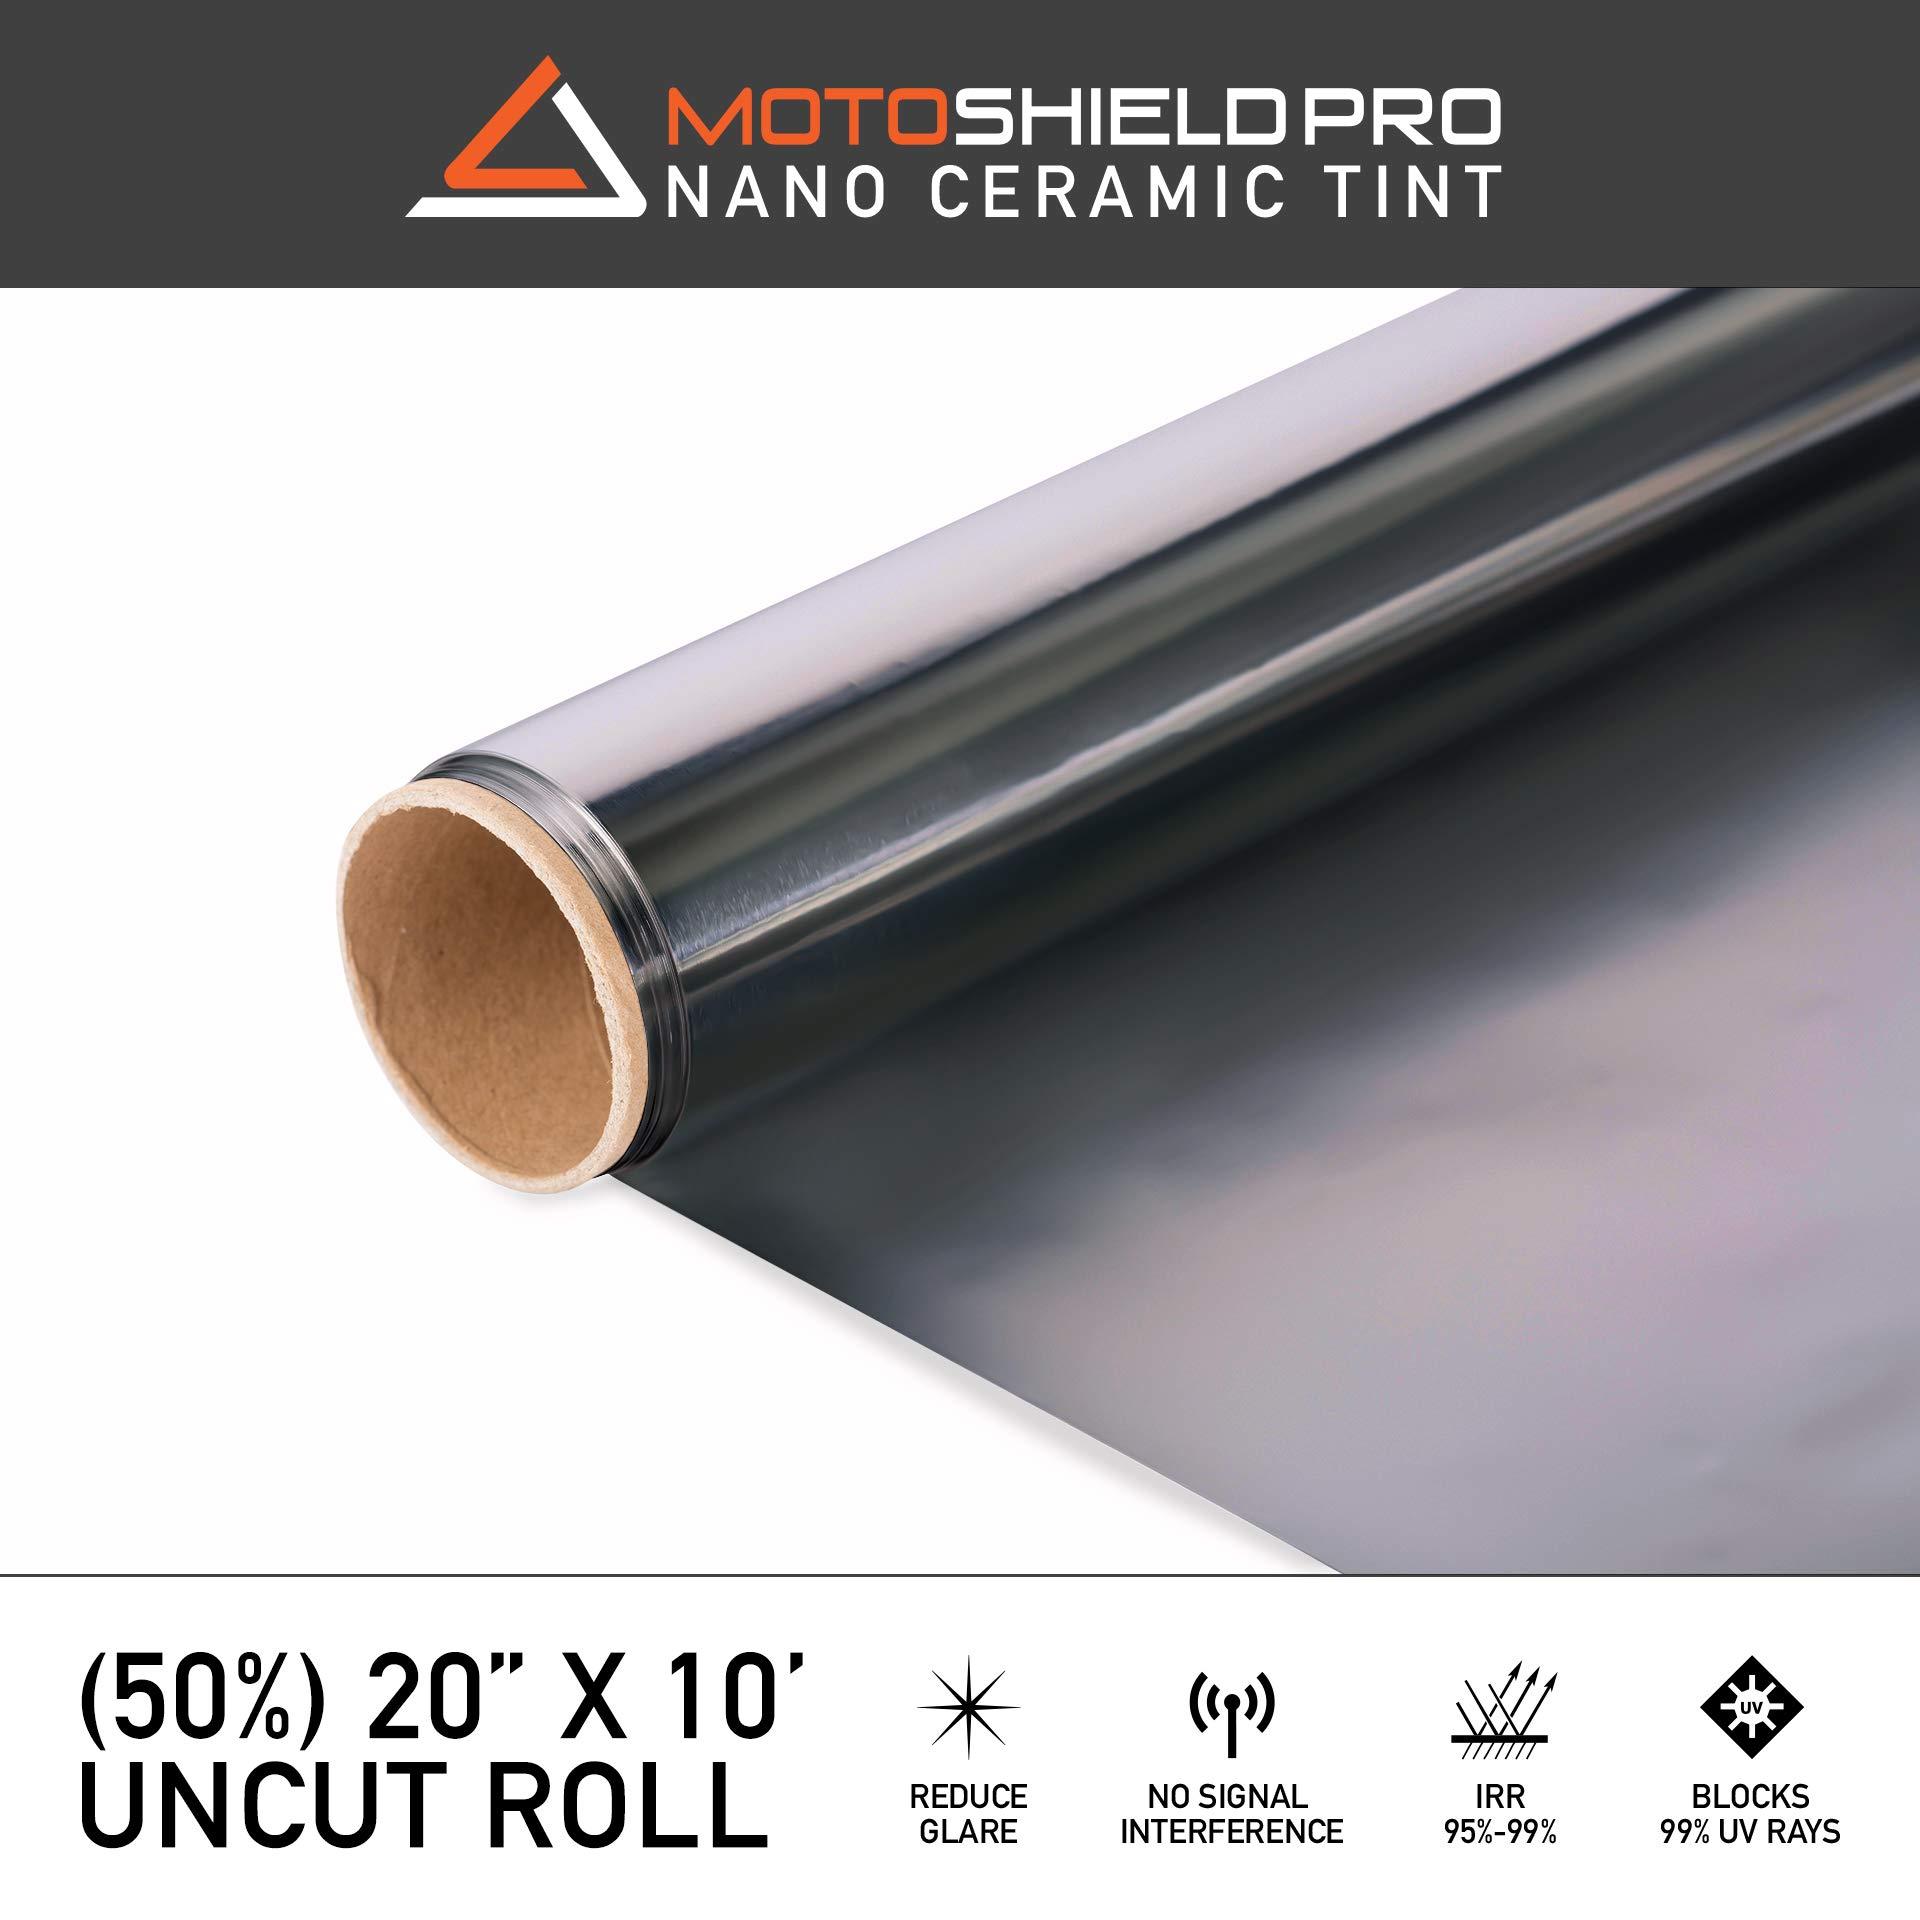 MotoShield Pro Ceramic Tint Film [Blocks Up to 99% of UV/IRR Rays] 20'' x 10' Window Tint Film ROLL (50%)